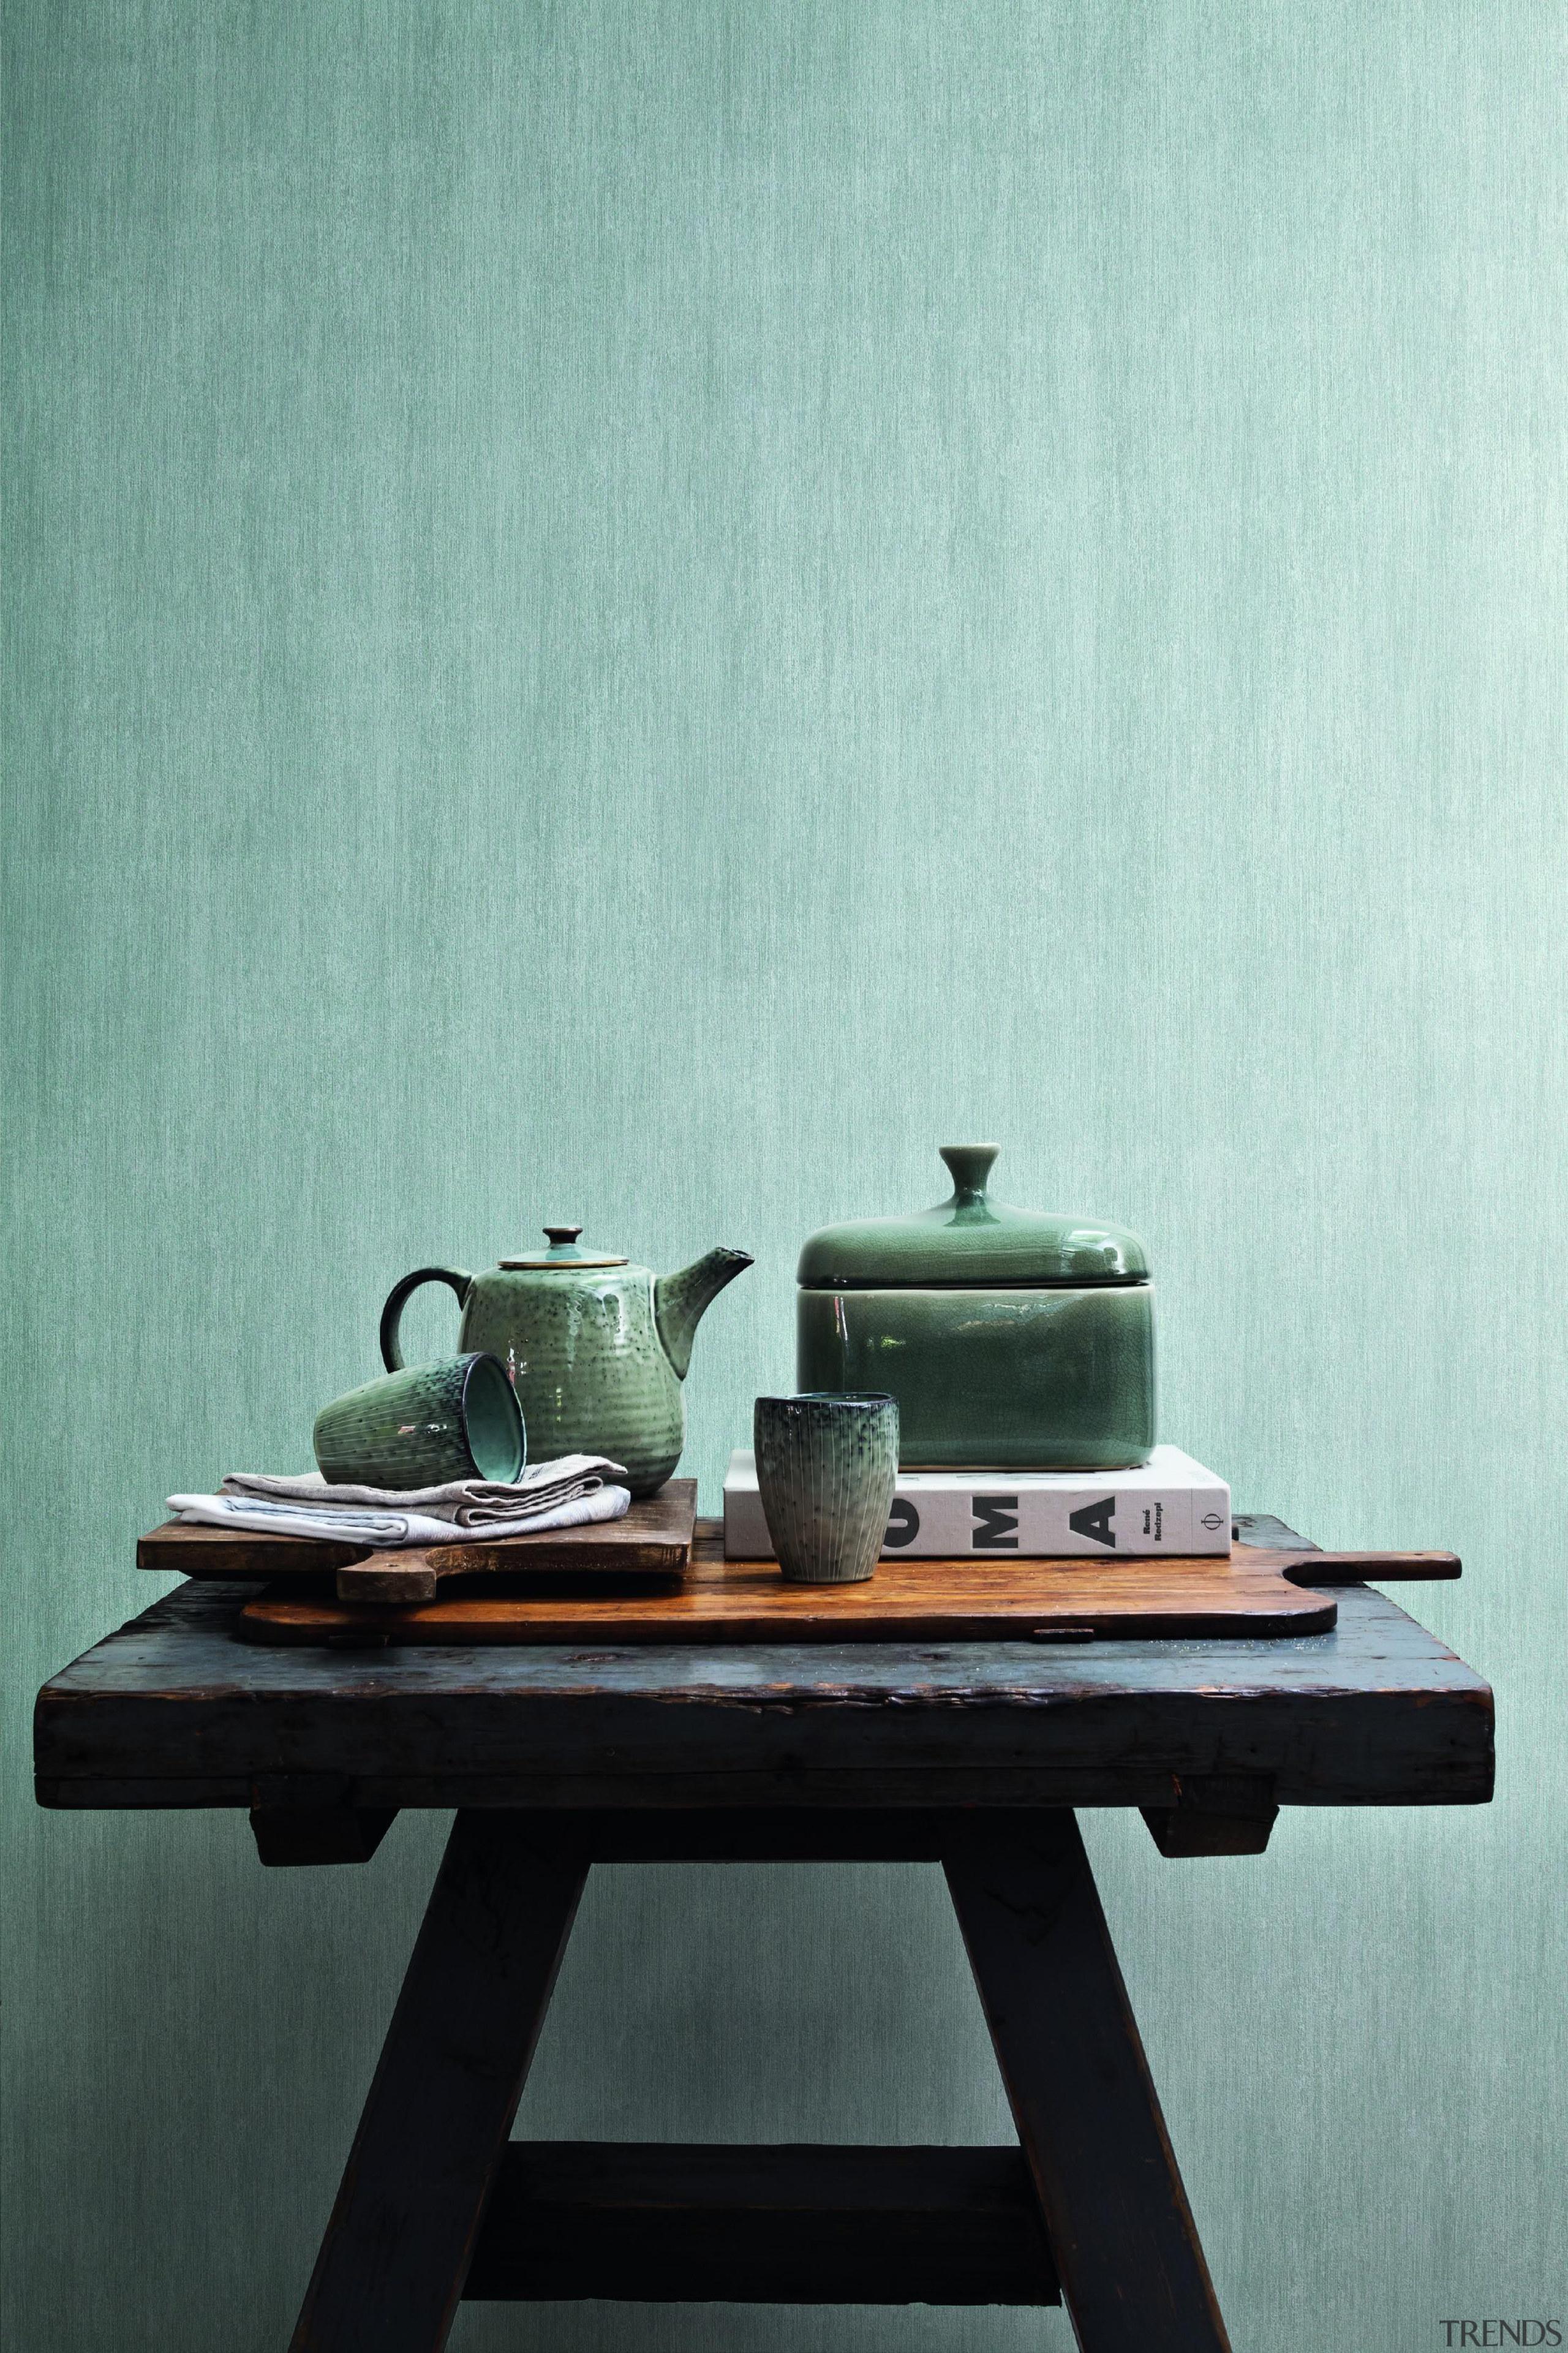 Camarque Range - Camarque Range - furniture | furniture, product design, still life, still life photography, table, teal